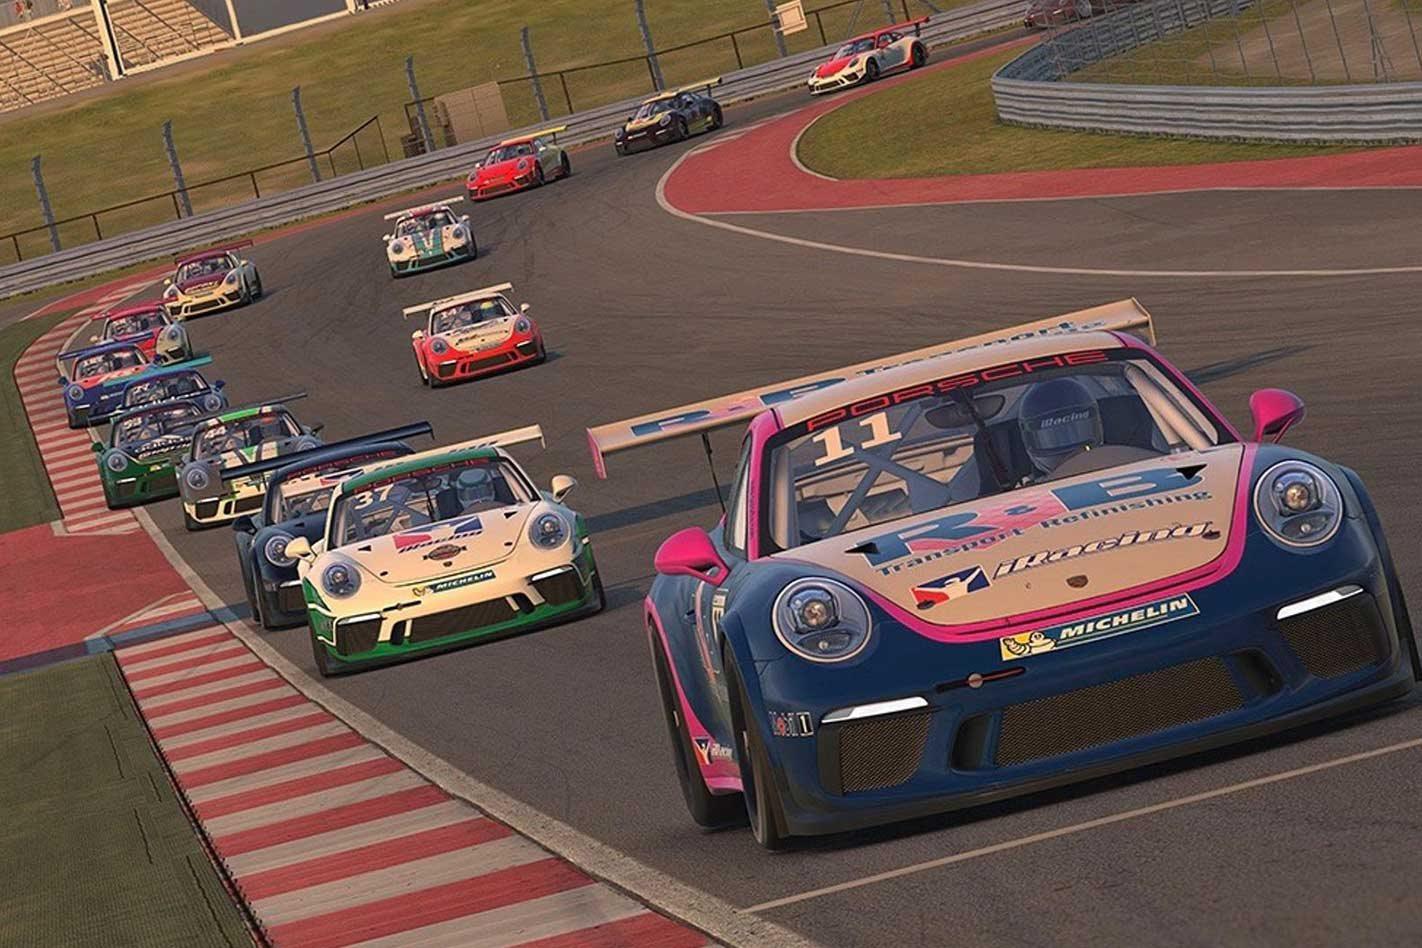 Porsche announces support for iRacing esports series